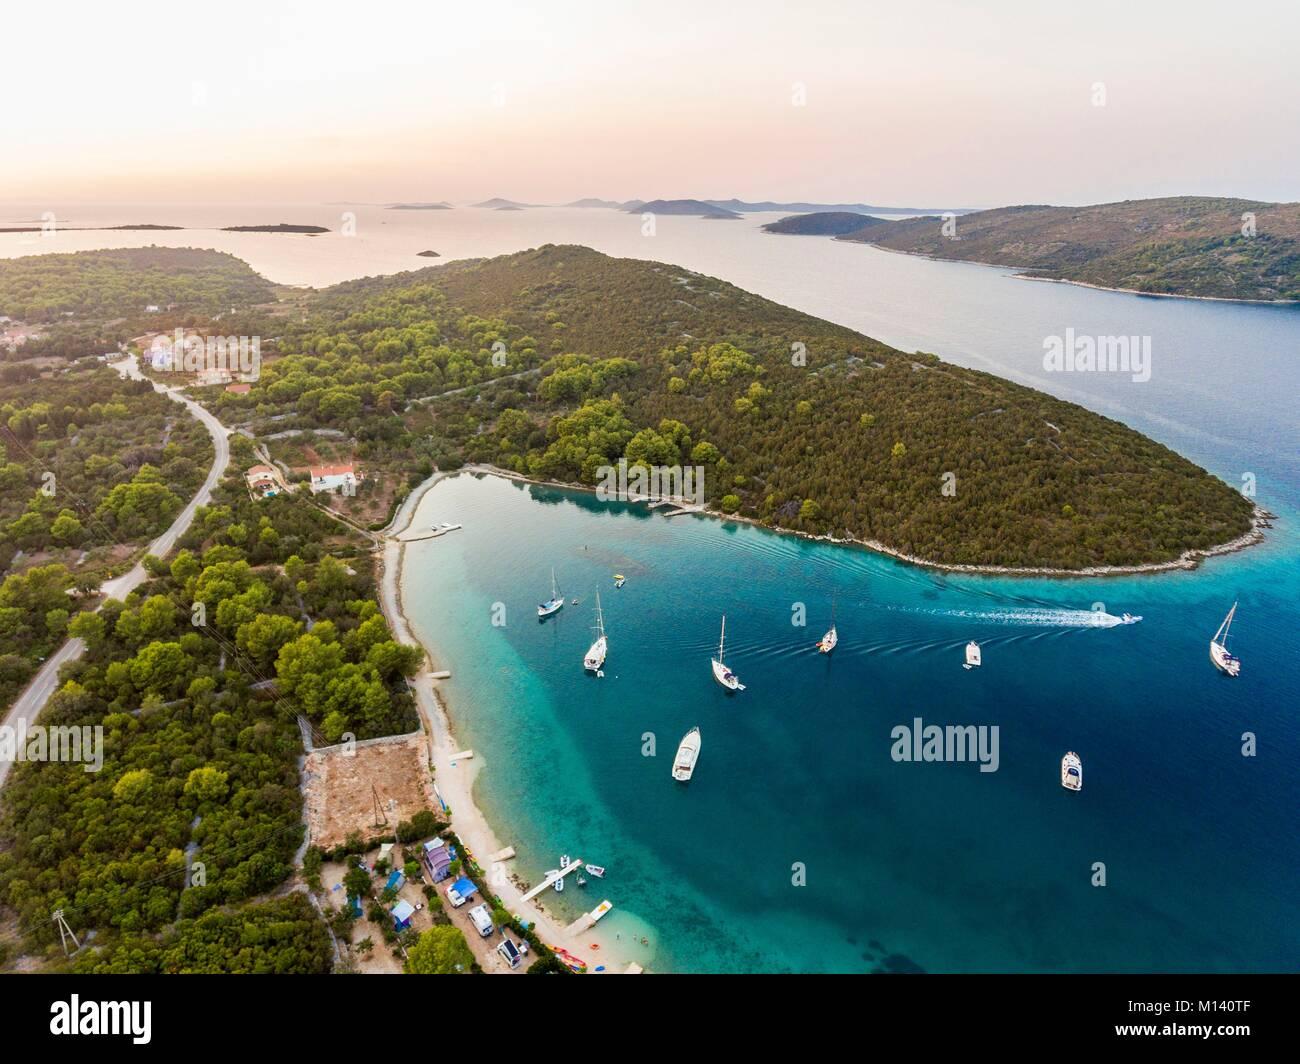 La Croatie, Dalmatie du Nord, de la côte dalmate, archipel de Zadar, l'île de Dugi Otok, camping Verunic Photo Stock